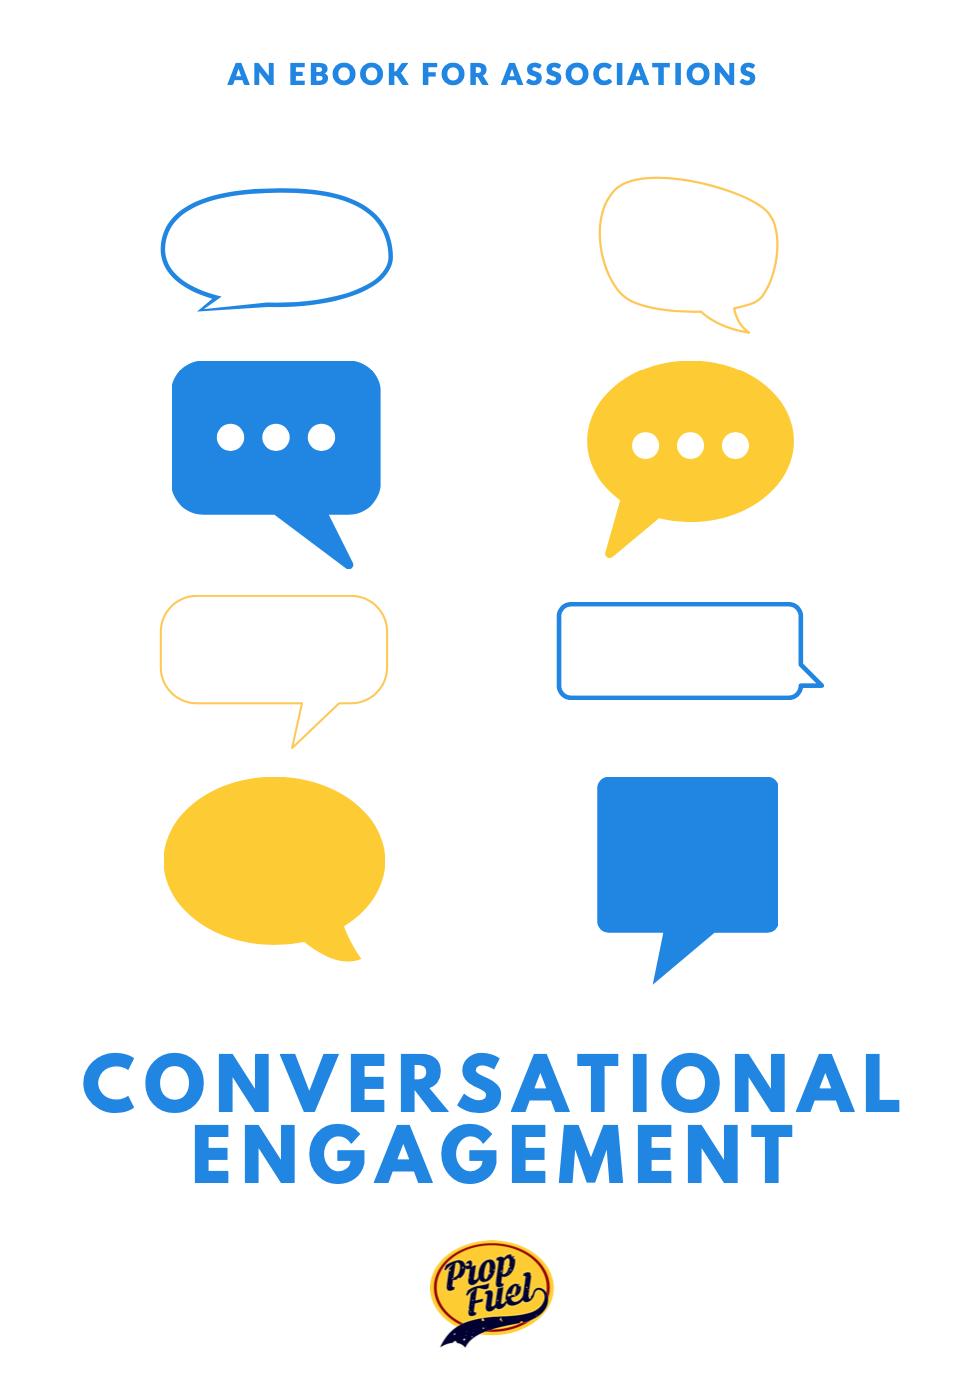 Conversational Engagement, the Ebook